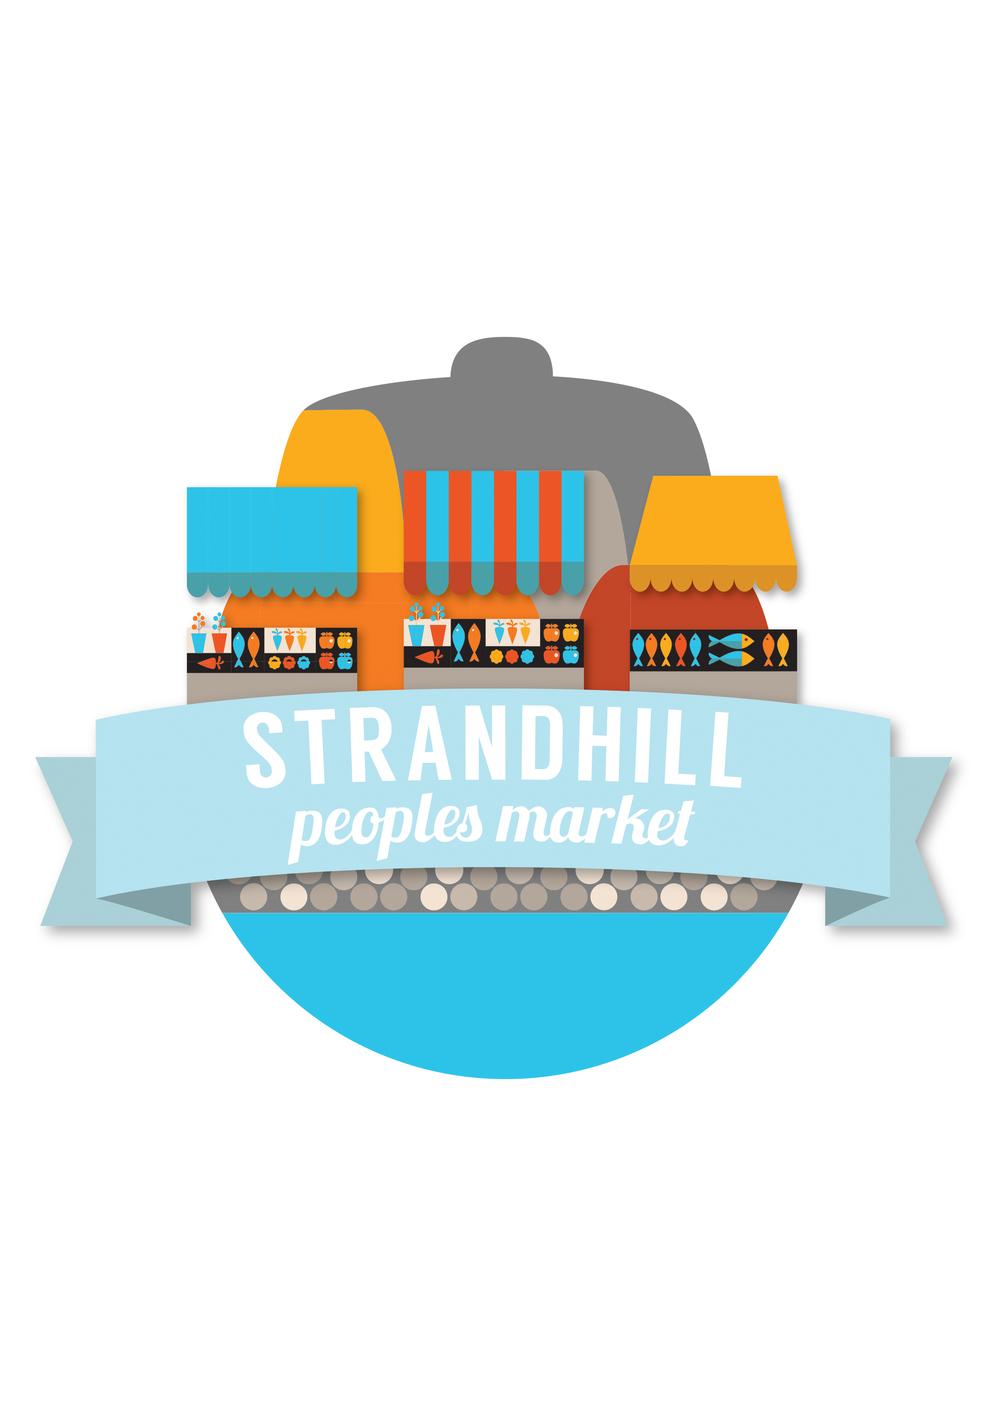 Strandhill people market logo.jpg